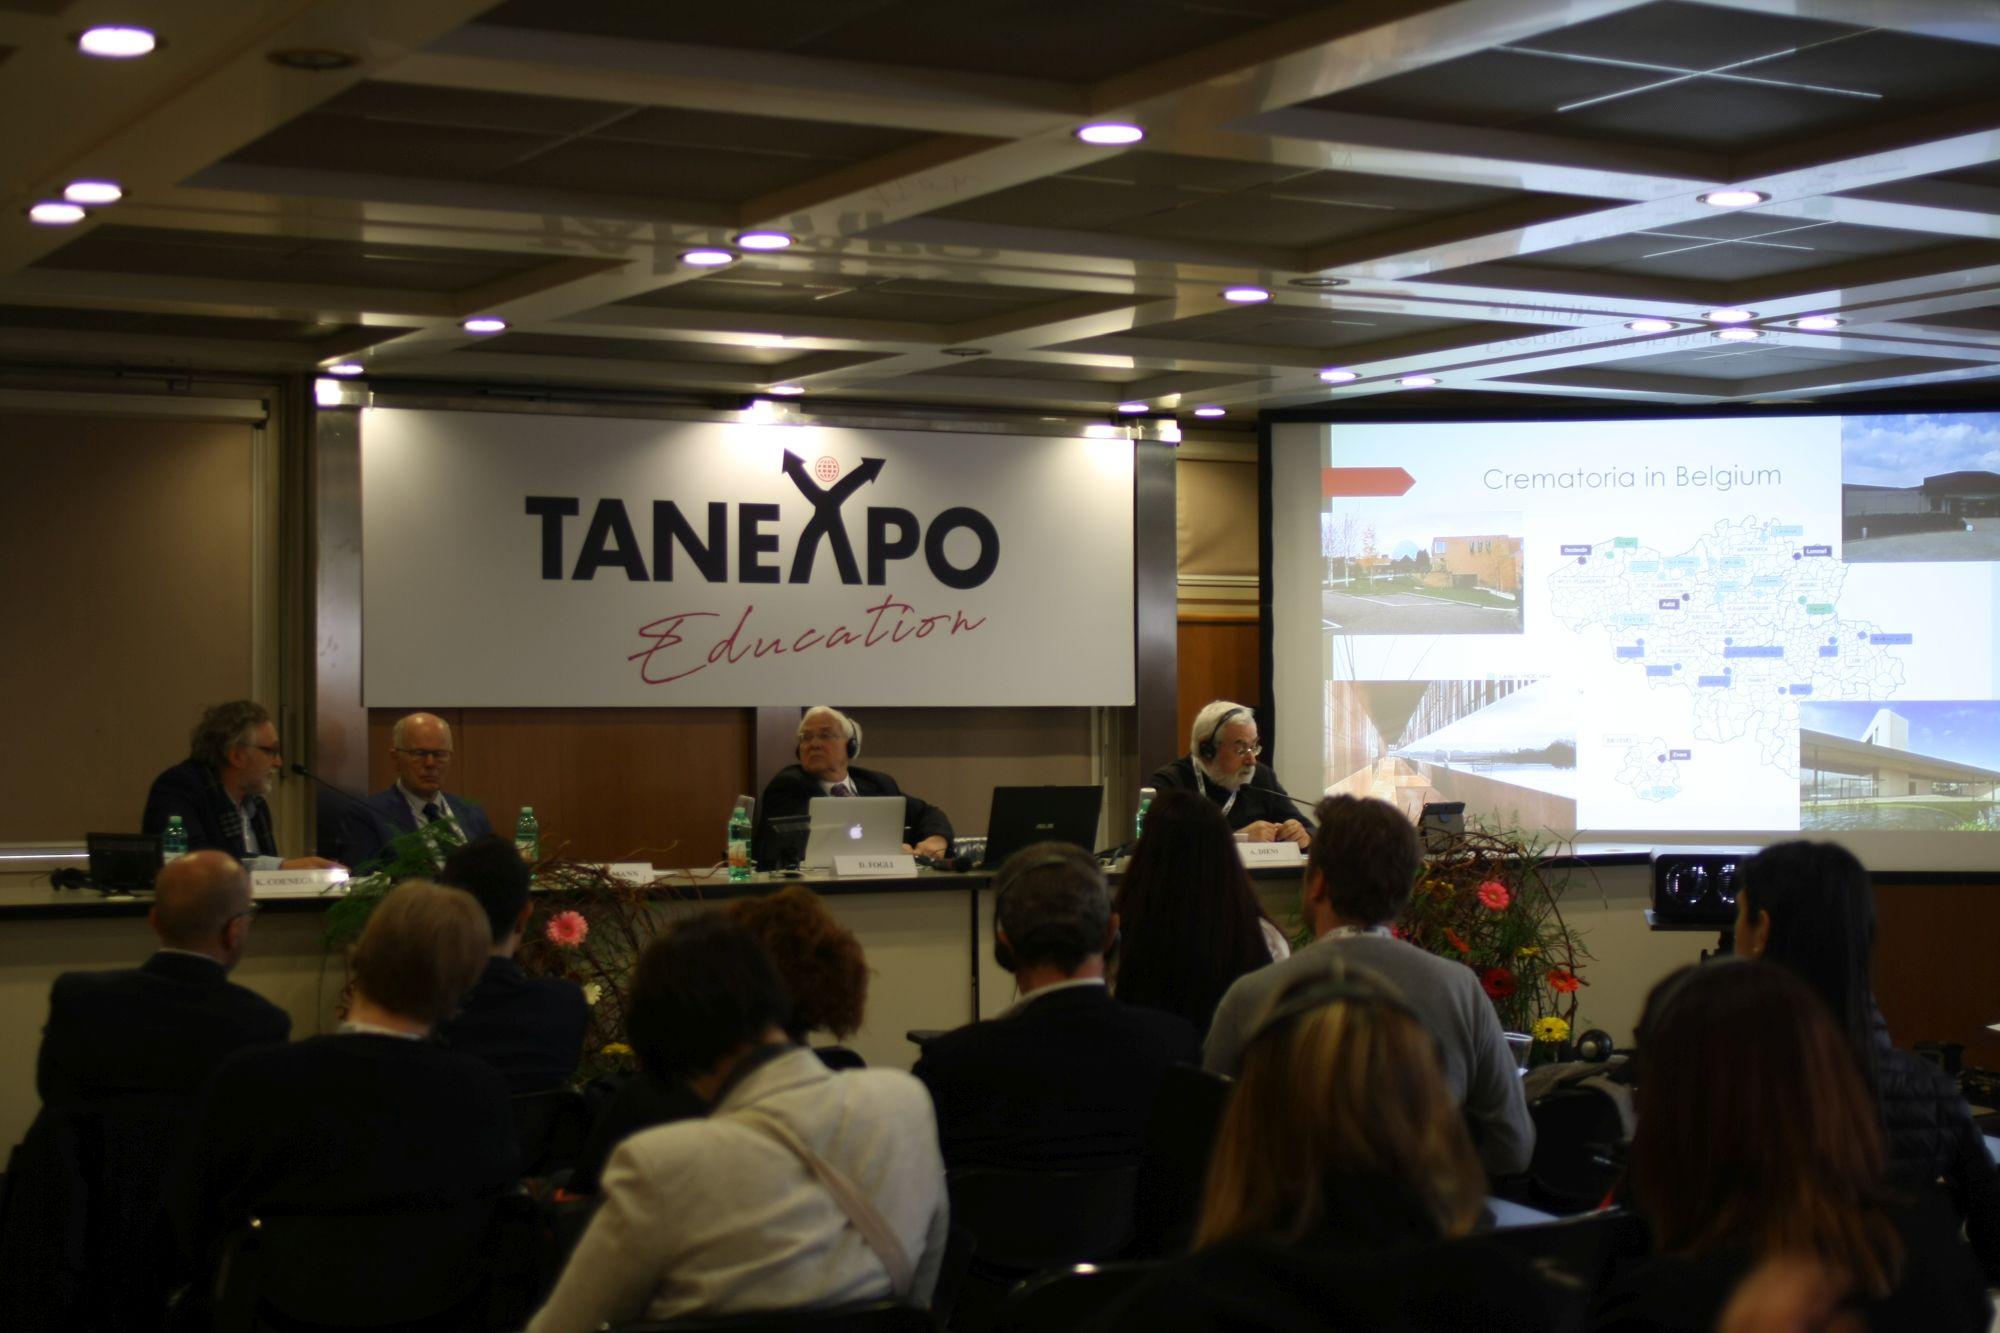 tanexpo eductaion